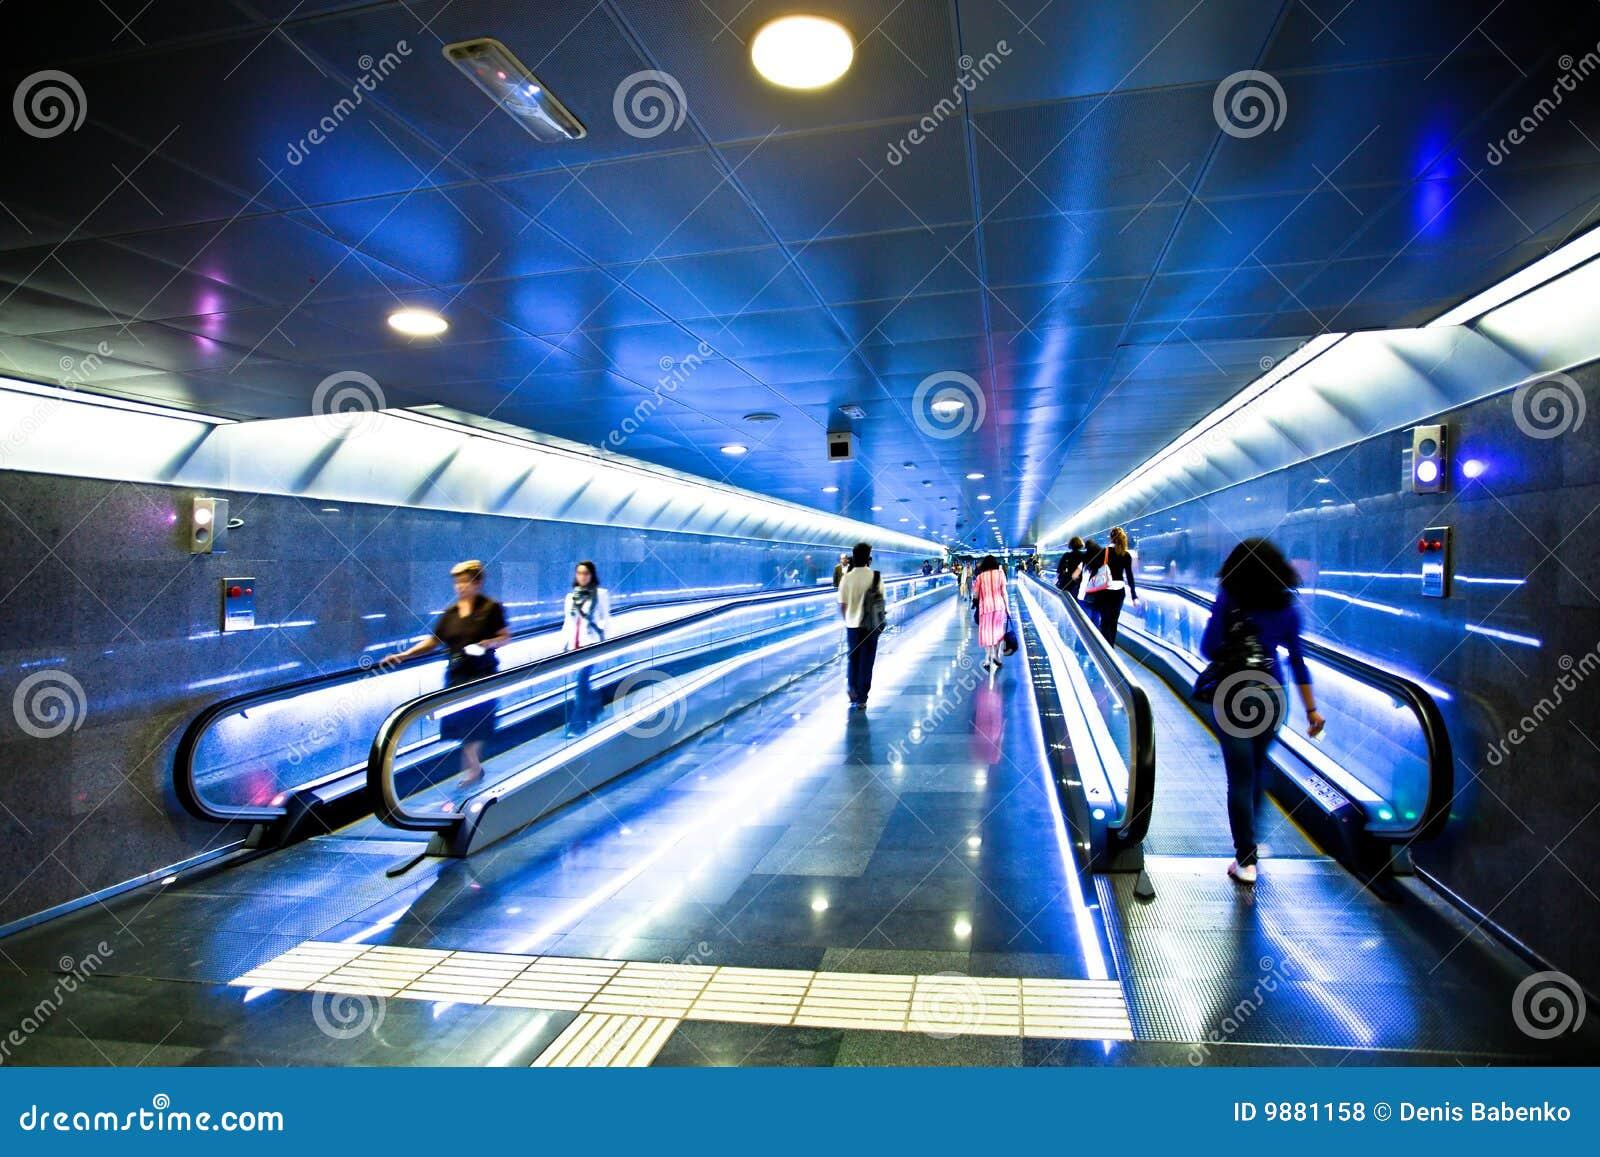 View to wide blue corridor with escalators